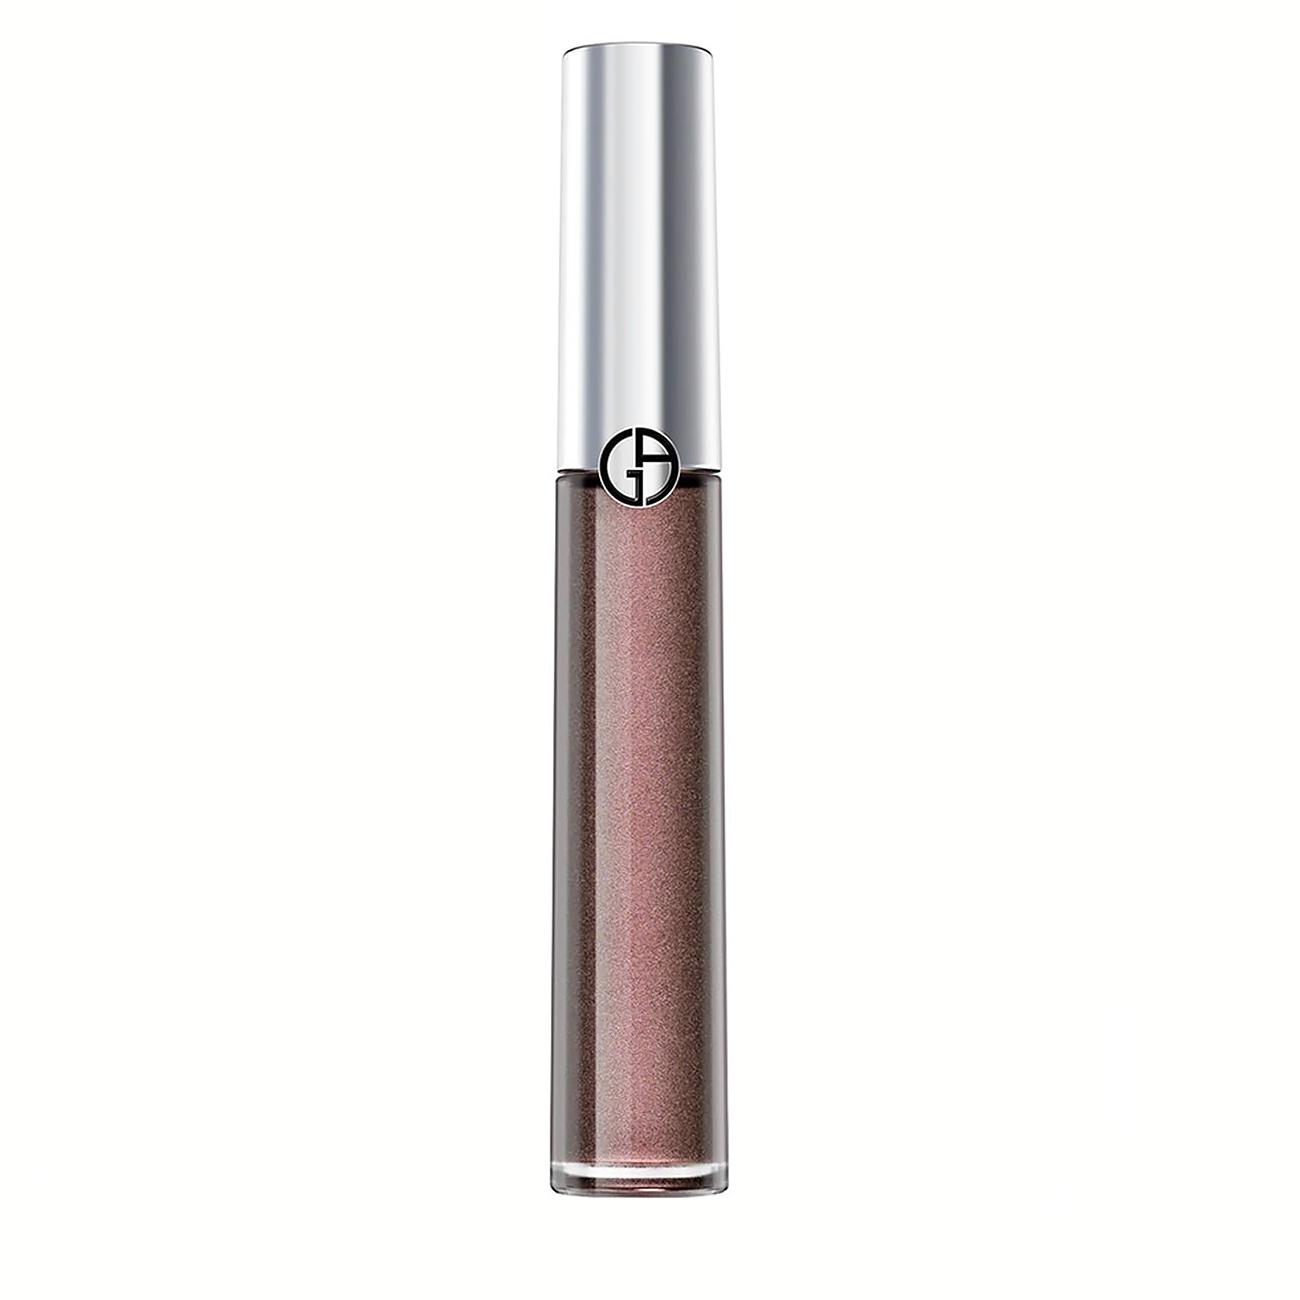 Eye Tint Eyeshadow 10 6.5ml Giorgio Armani imagine 2021 bestvalue.eu